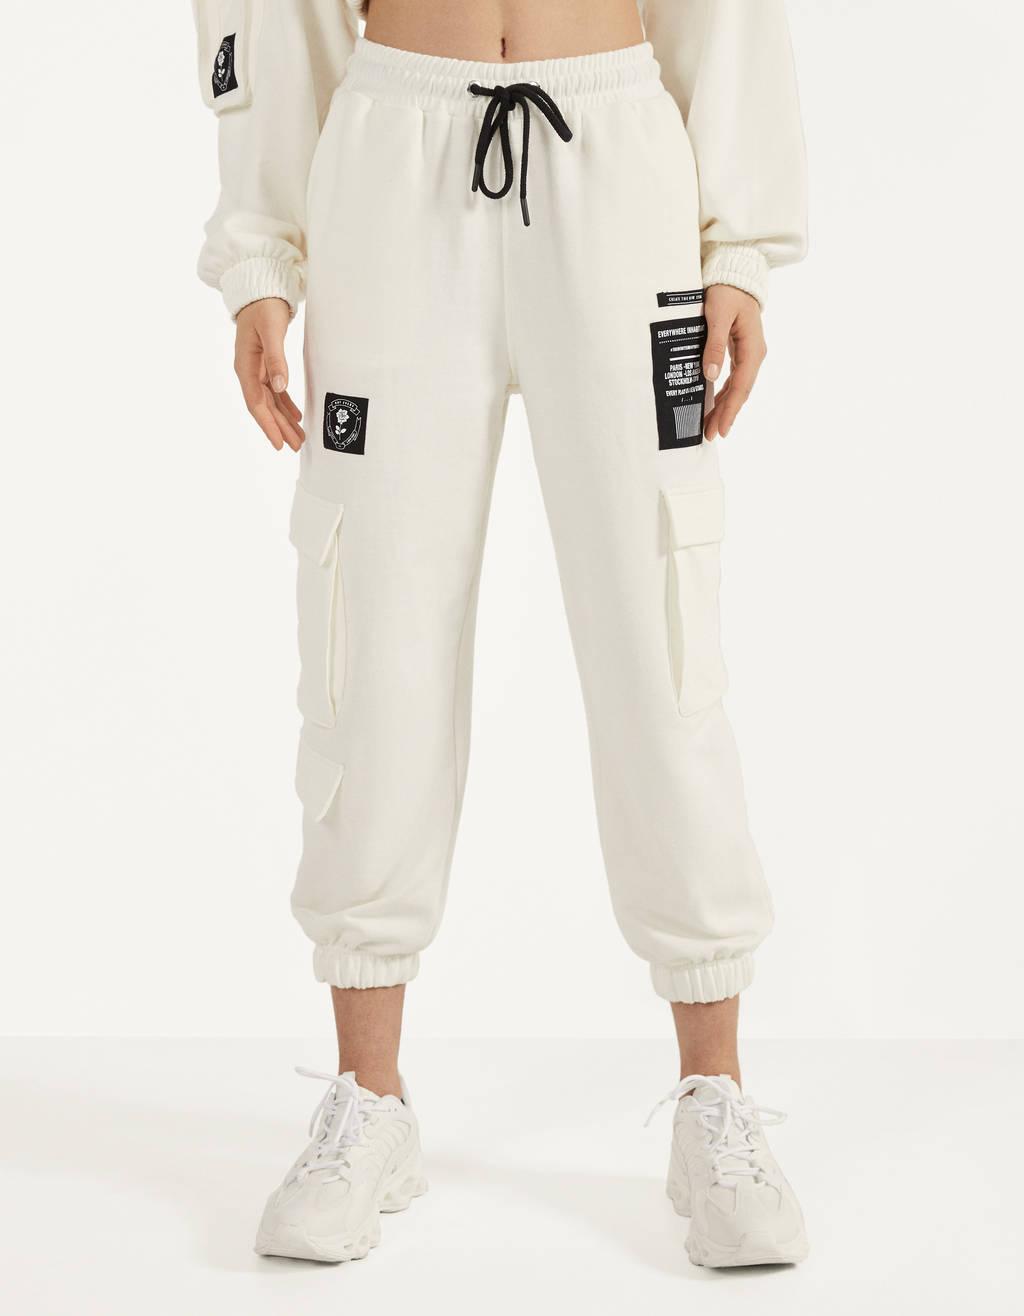 Pantalones De Chandal Mujer Bershka 64 Descuento Gigarobot Net